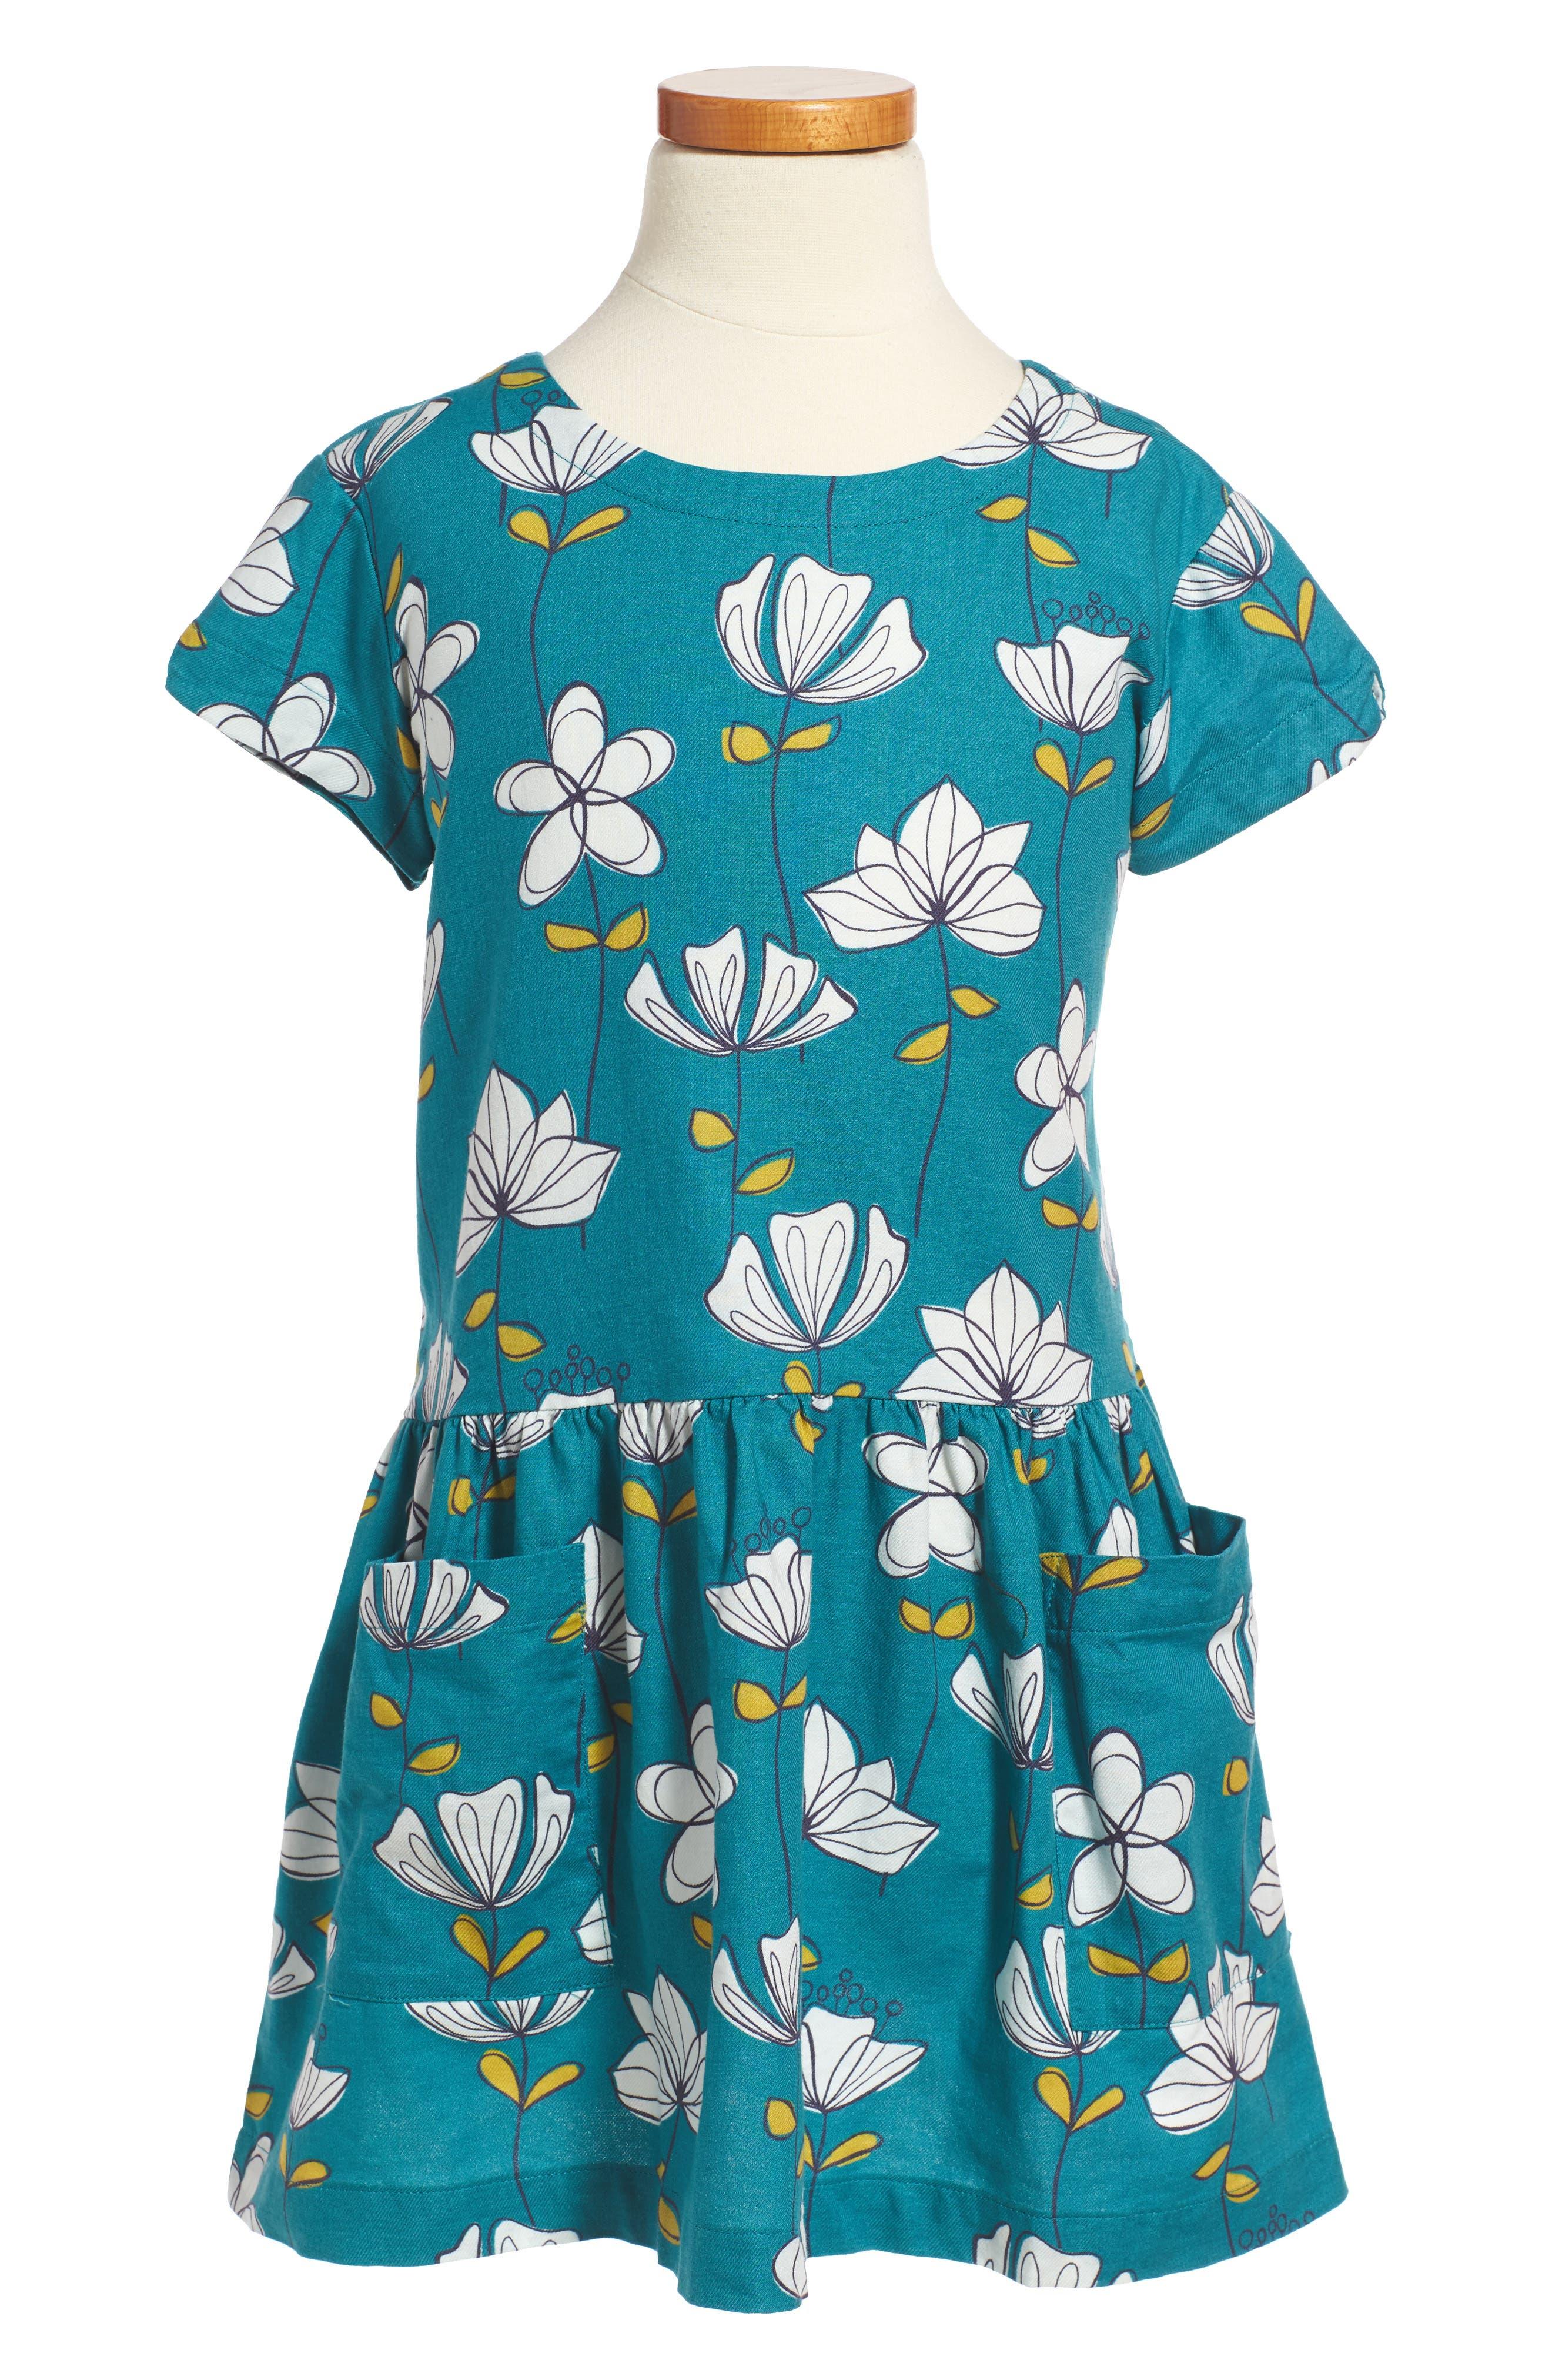 Alternate Image 1 Selected - Tea Collection Brianna Pocket Dress (Toddler Girls, Little Girls & Big Girls)